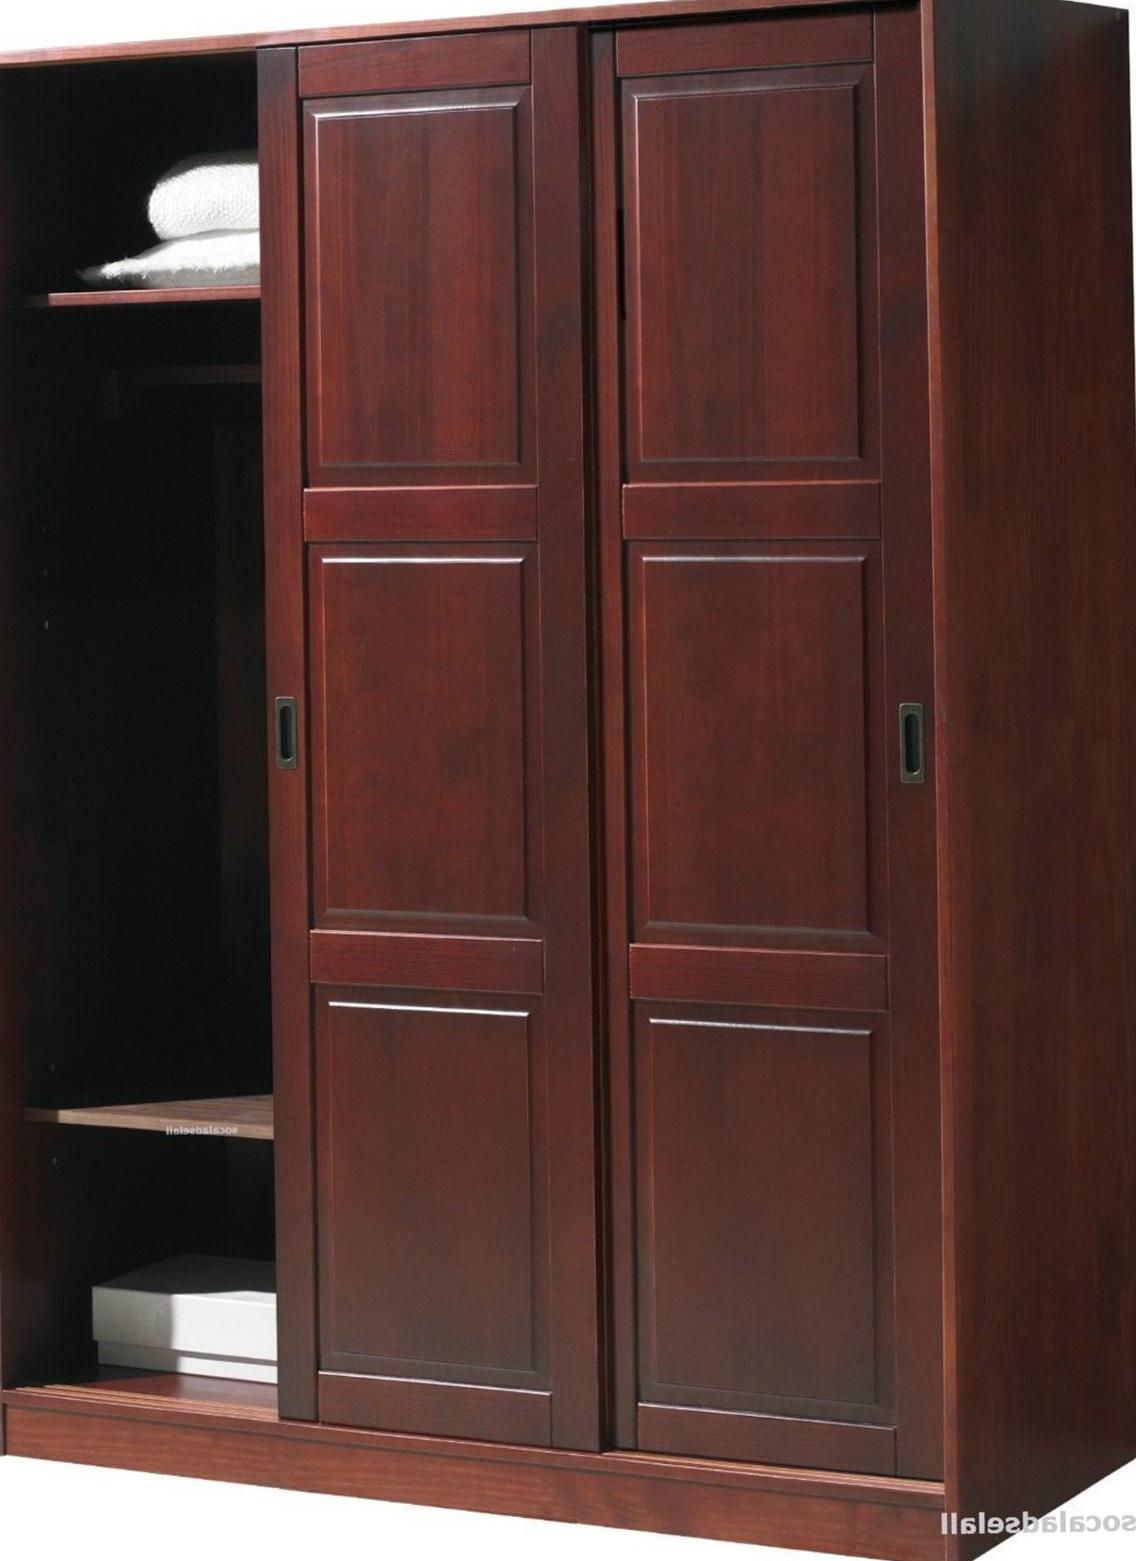 Sliding Wood Closet Doors Lowes Home Design Ideas